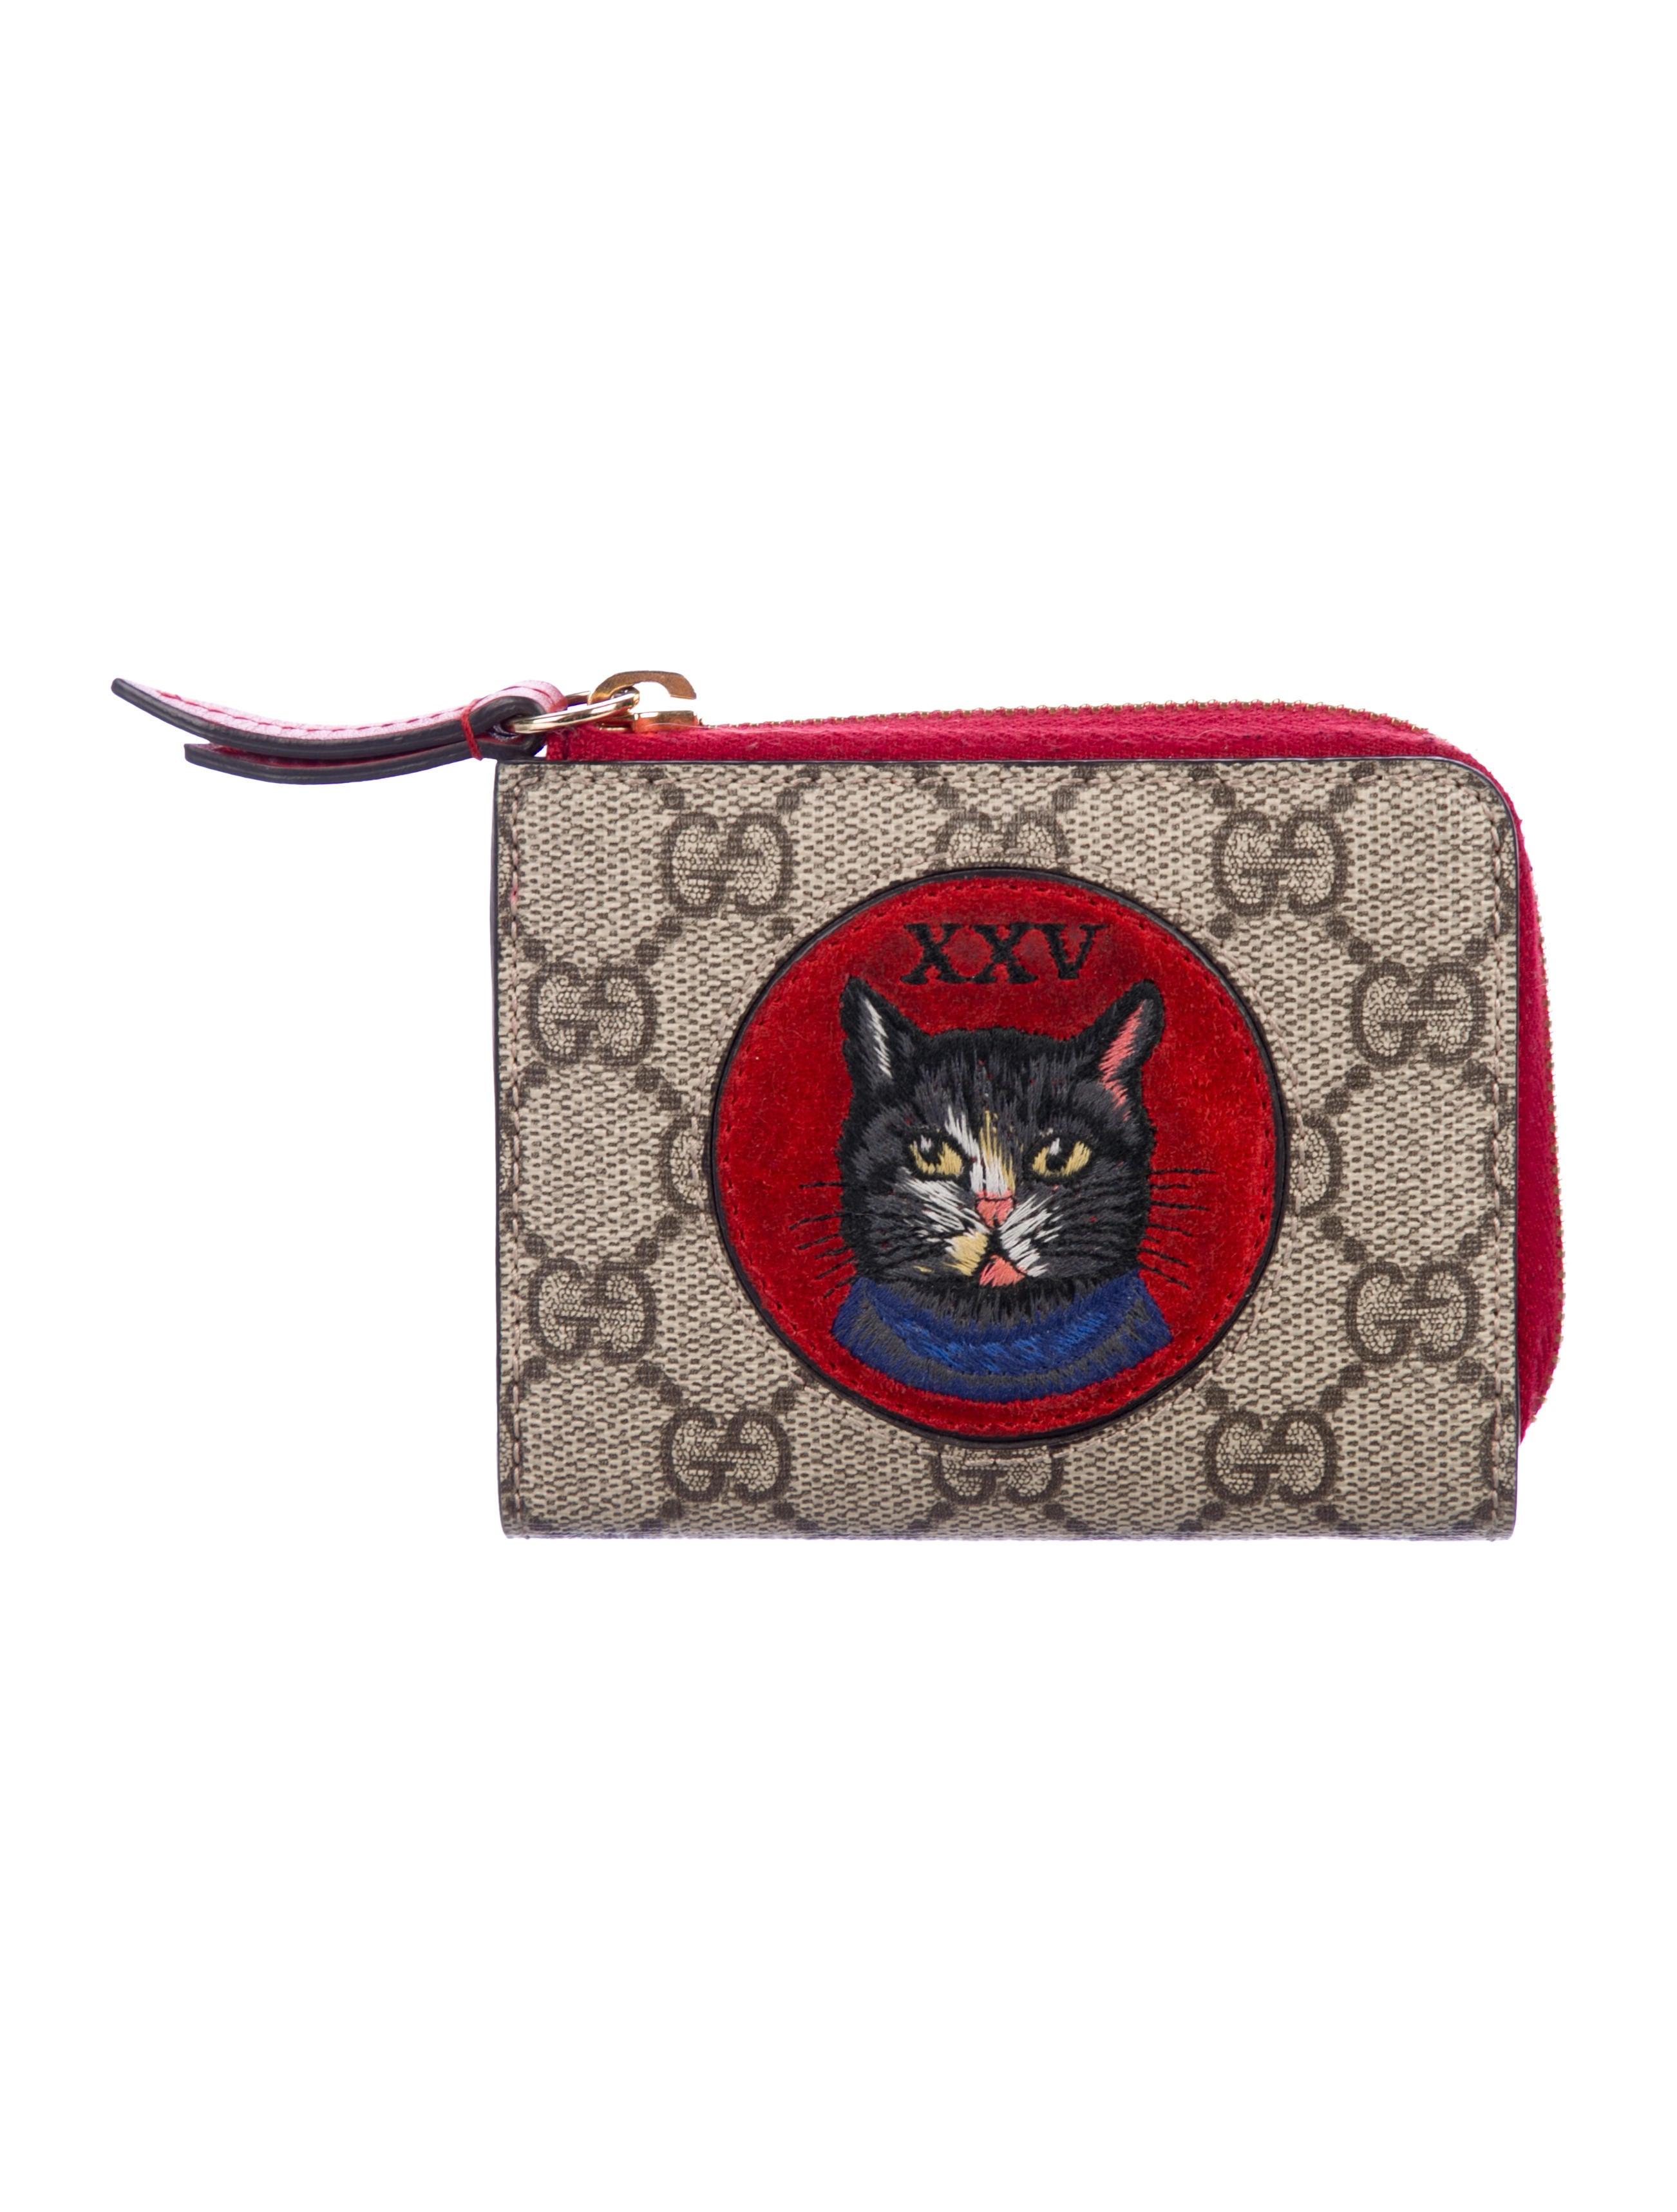 fae6fda1fcf Gucci Mystic Cat Cardholder - Accessories - GUC262521